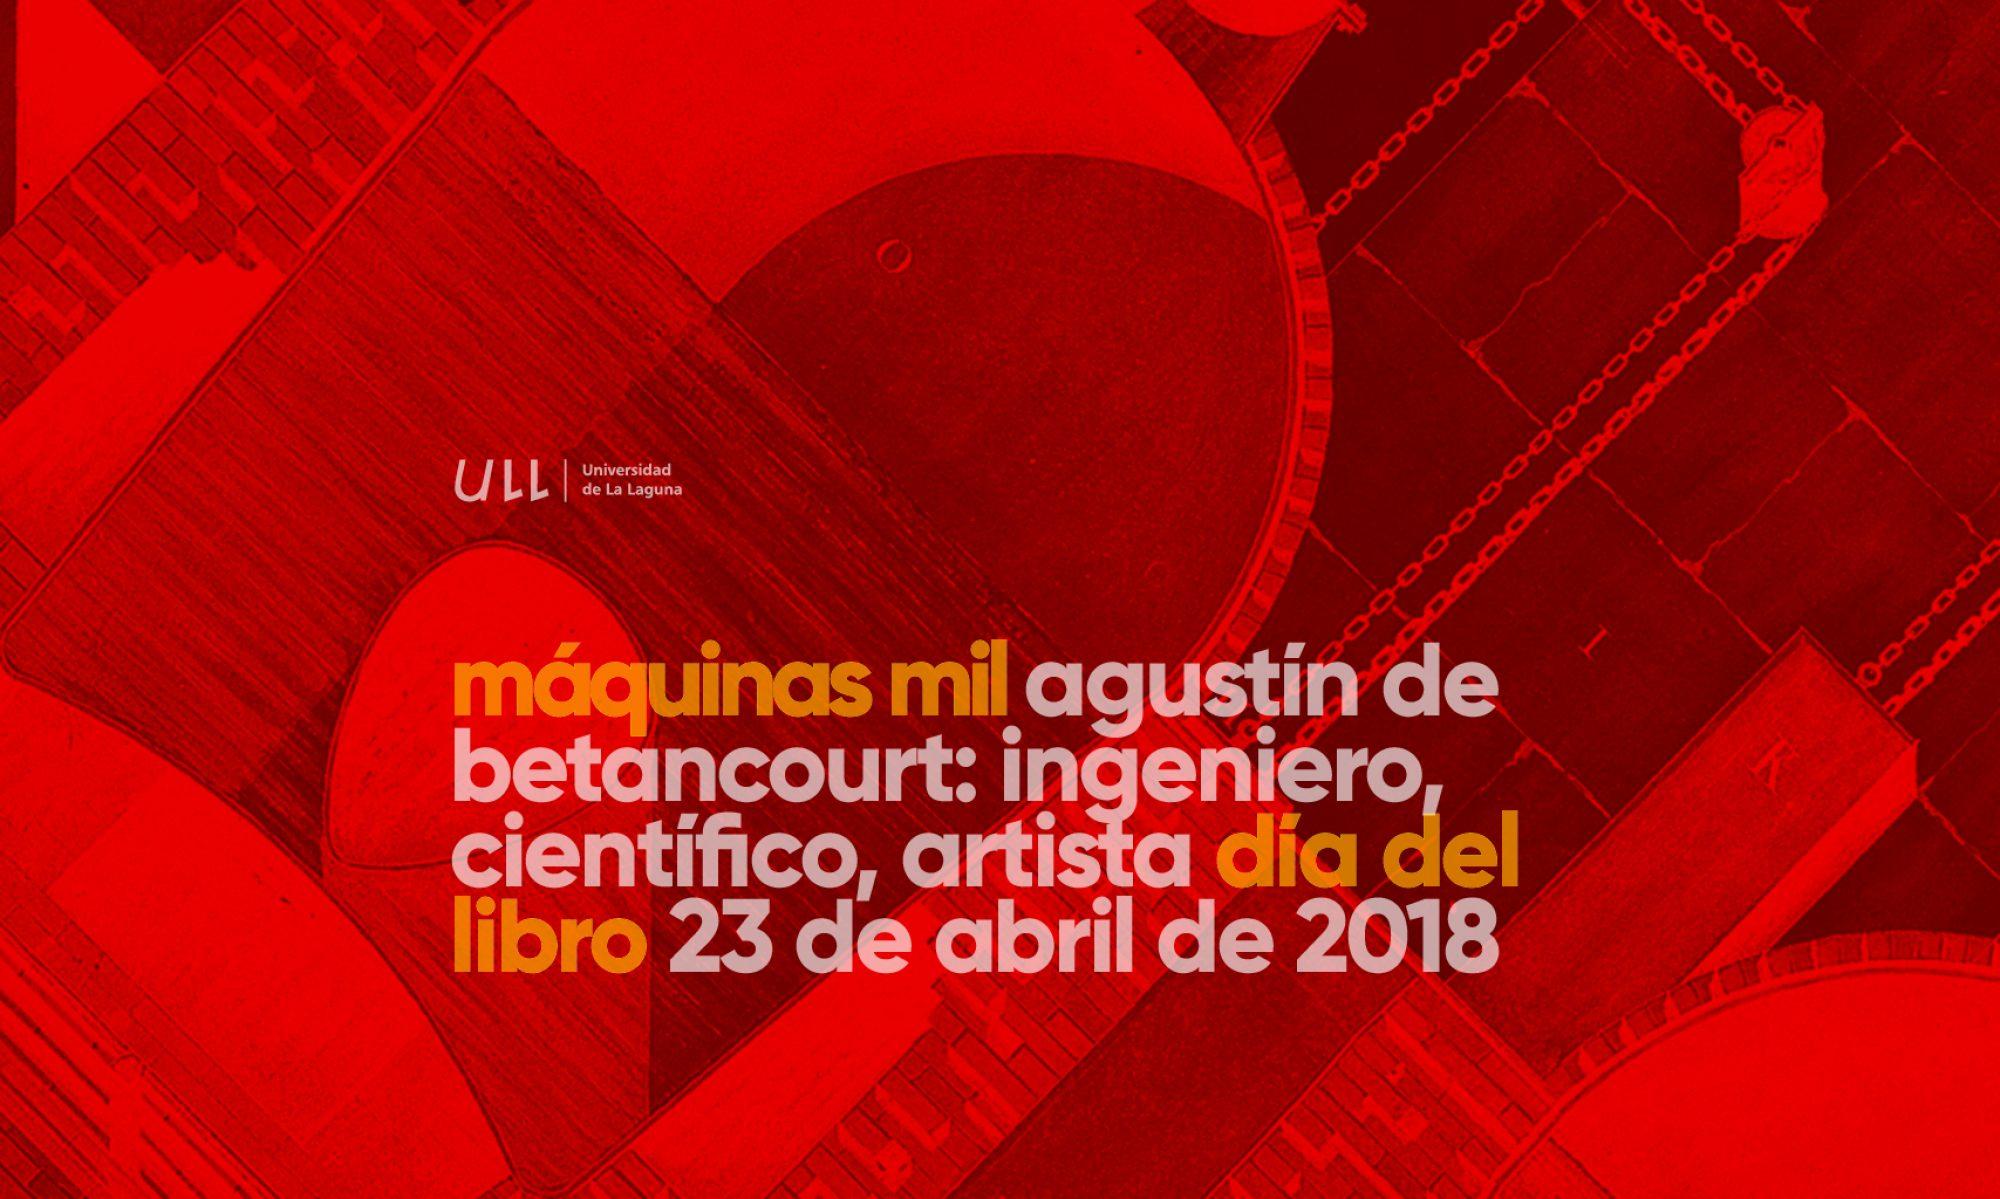 Agustín de Betancourt: ingeniero, científico, artista